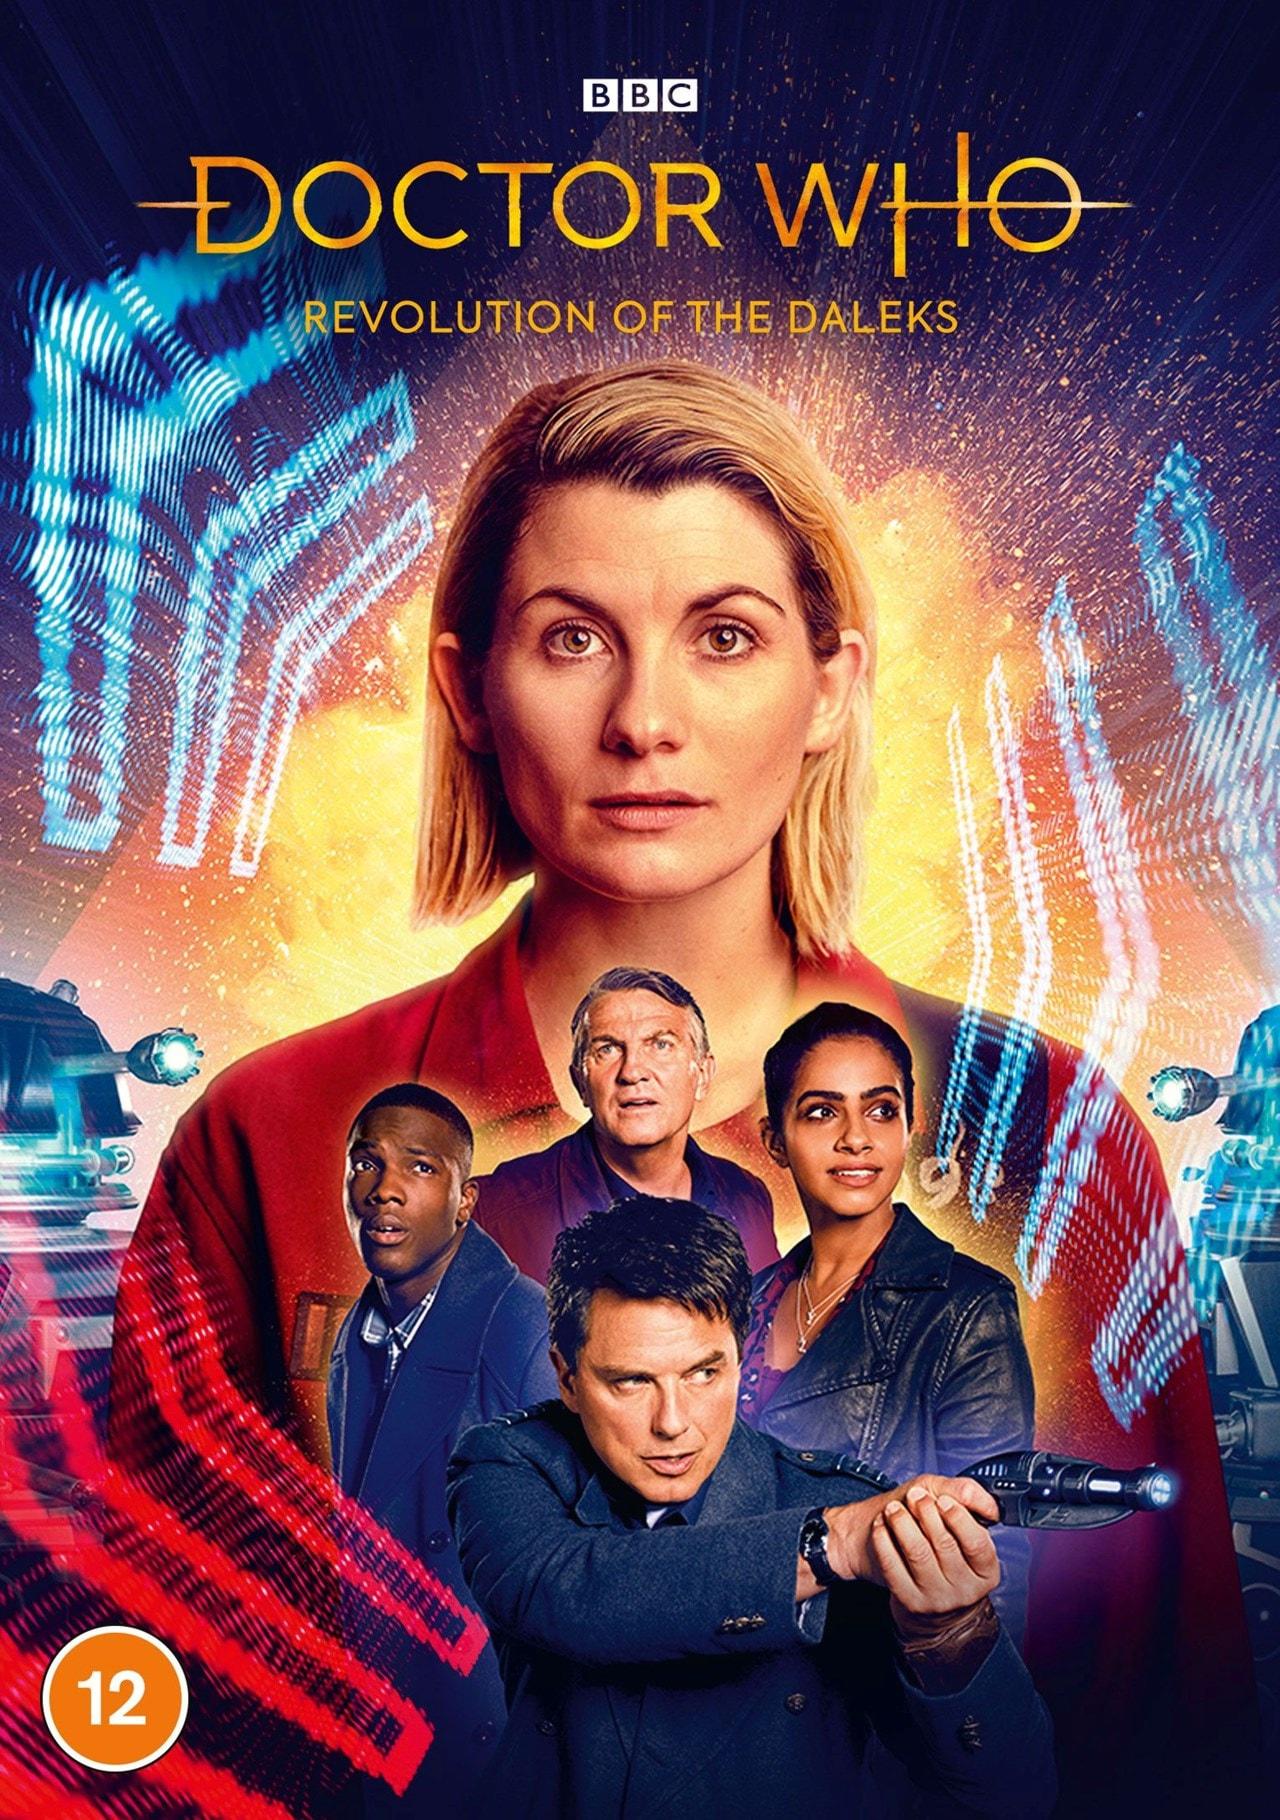 Doctor Who: Revolution of the Daleks - 1